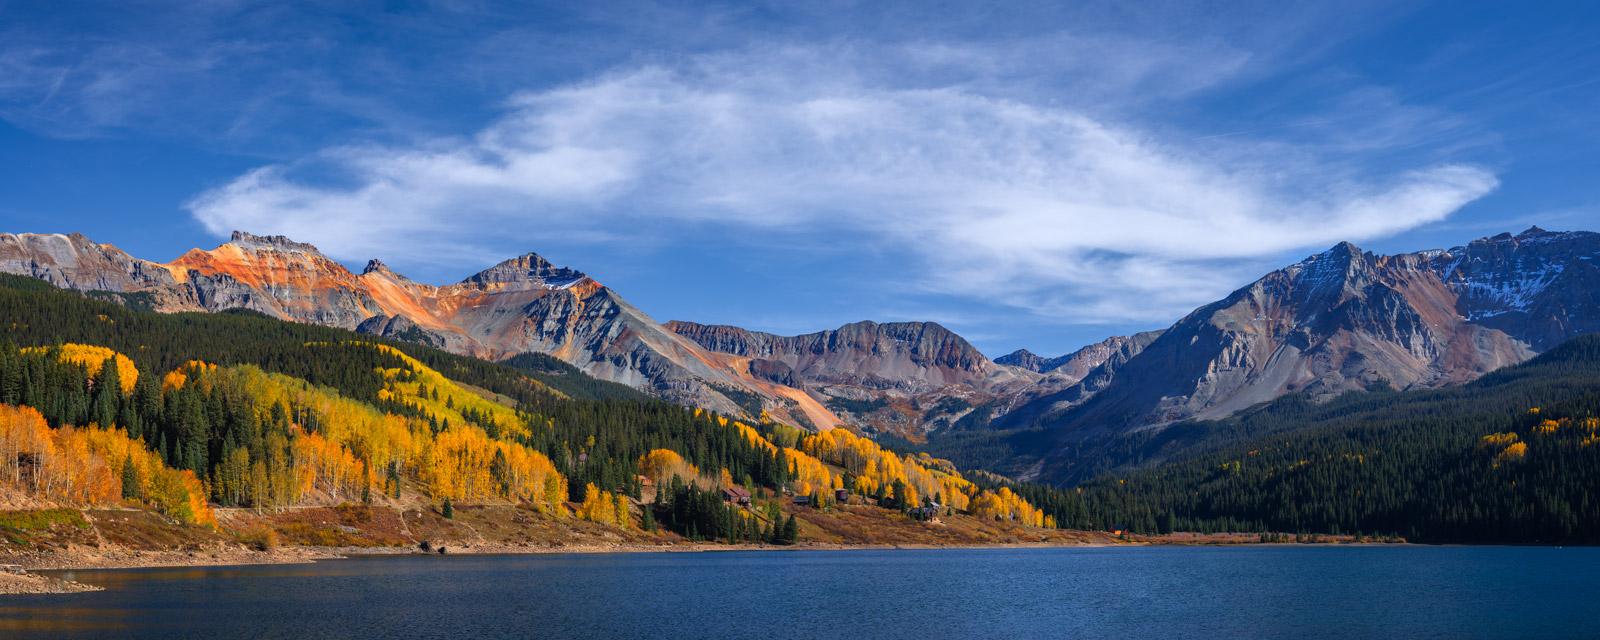 Colorado, southwest Colorado, trout lake, fall colors, mountains, San Juan Mountains, photo